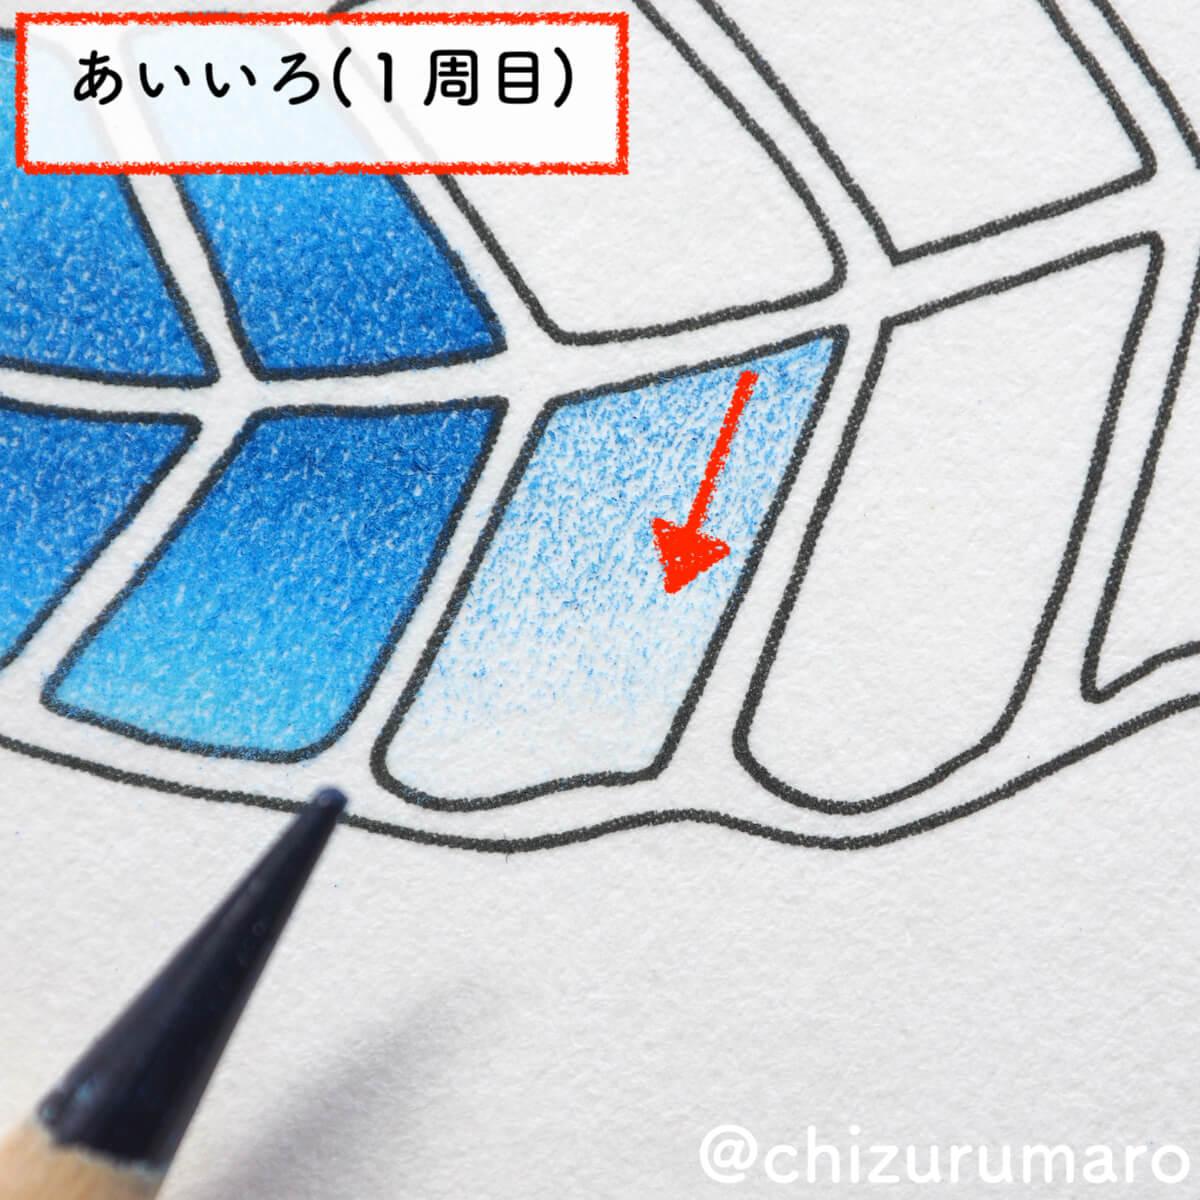 f:id:chizurumaro:20200616104523j:plain